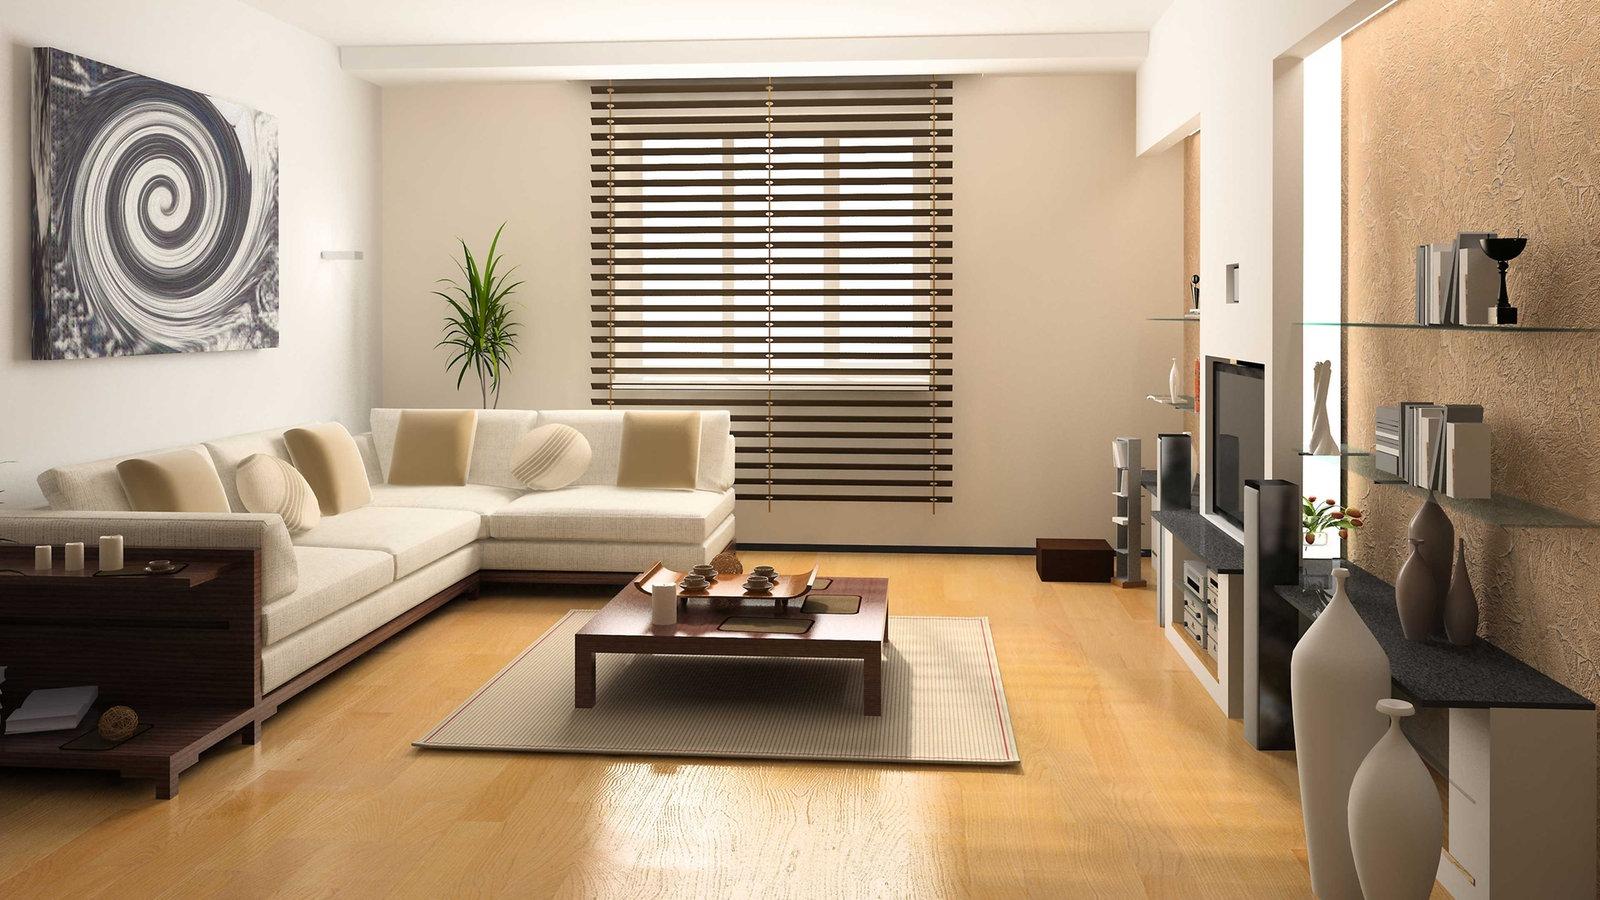 minimalismus simplify your life minimalismus On ratgeber minimalismus